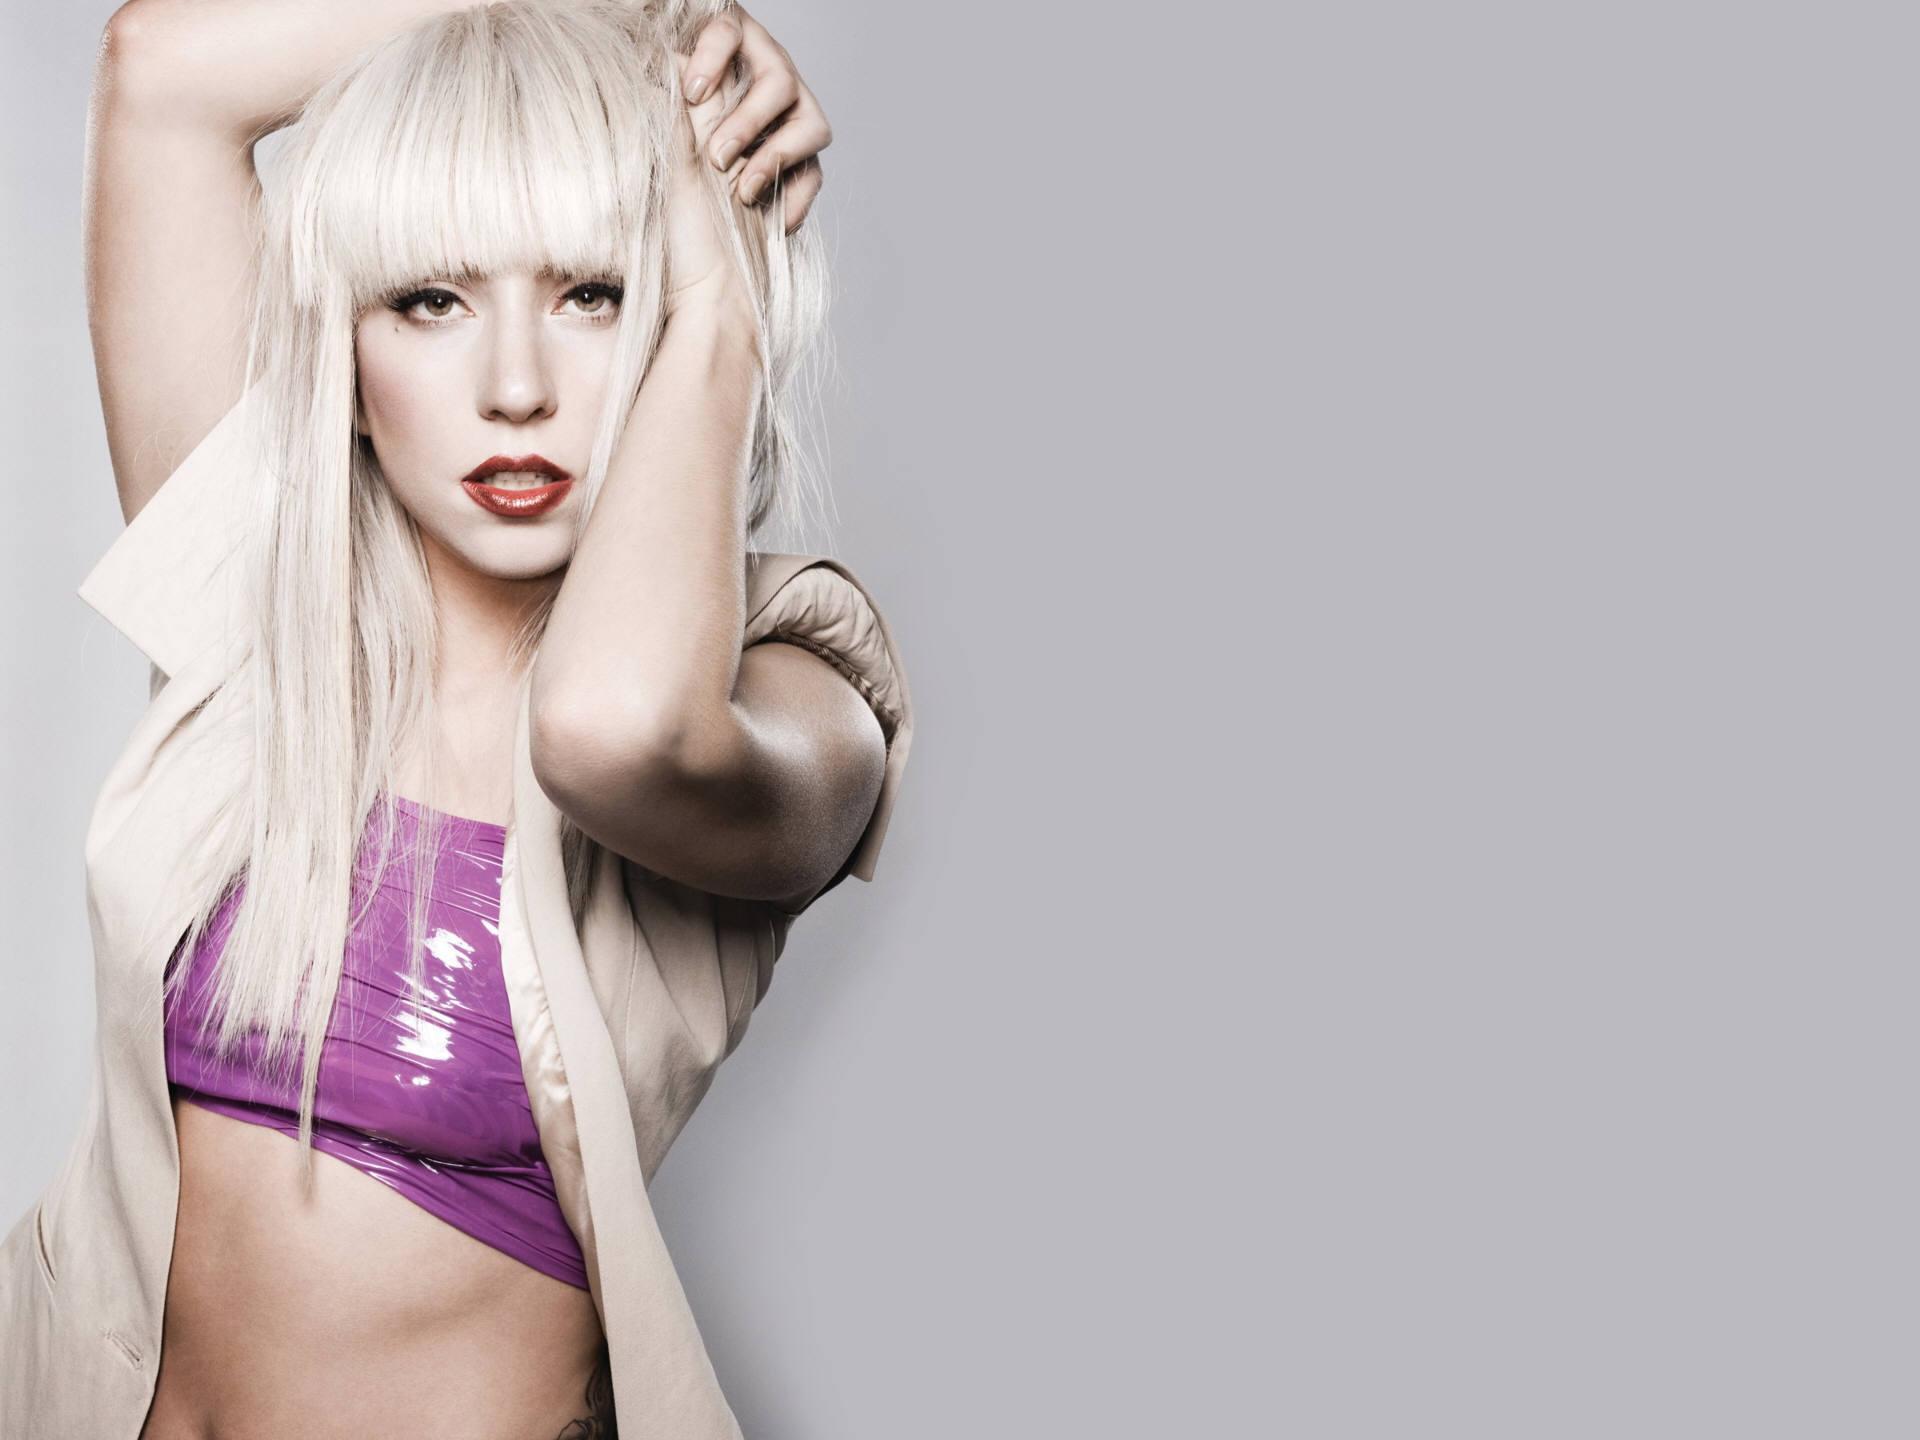 Lady Gaga et ses rondeurs